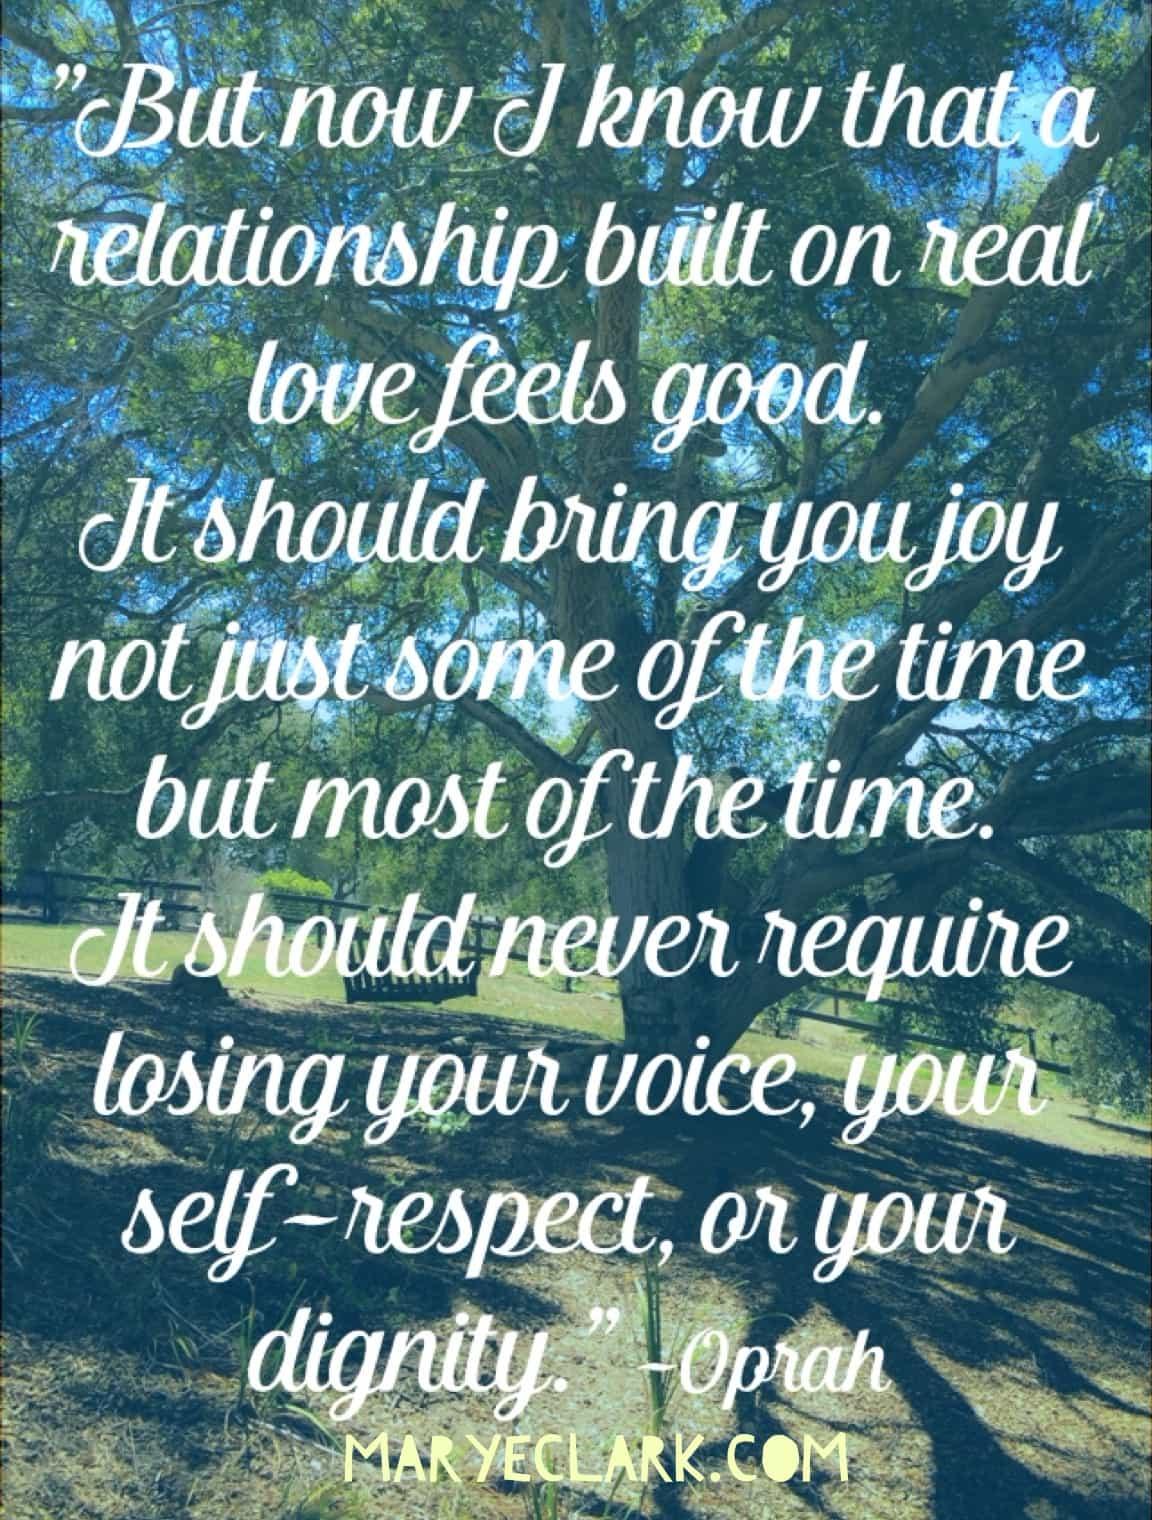 Oprah relationships dignity